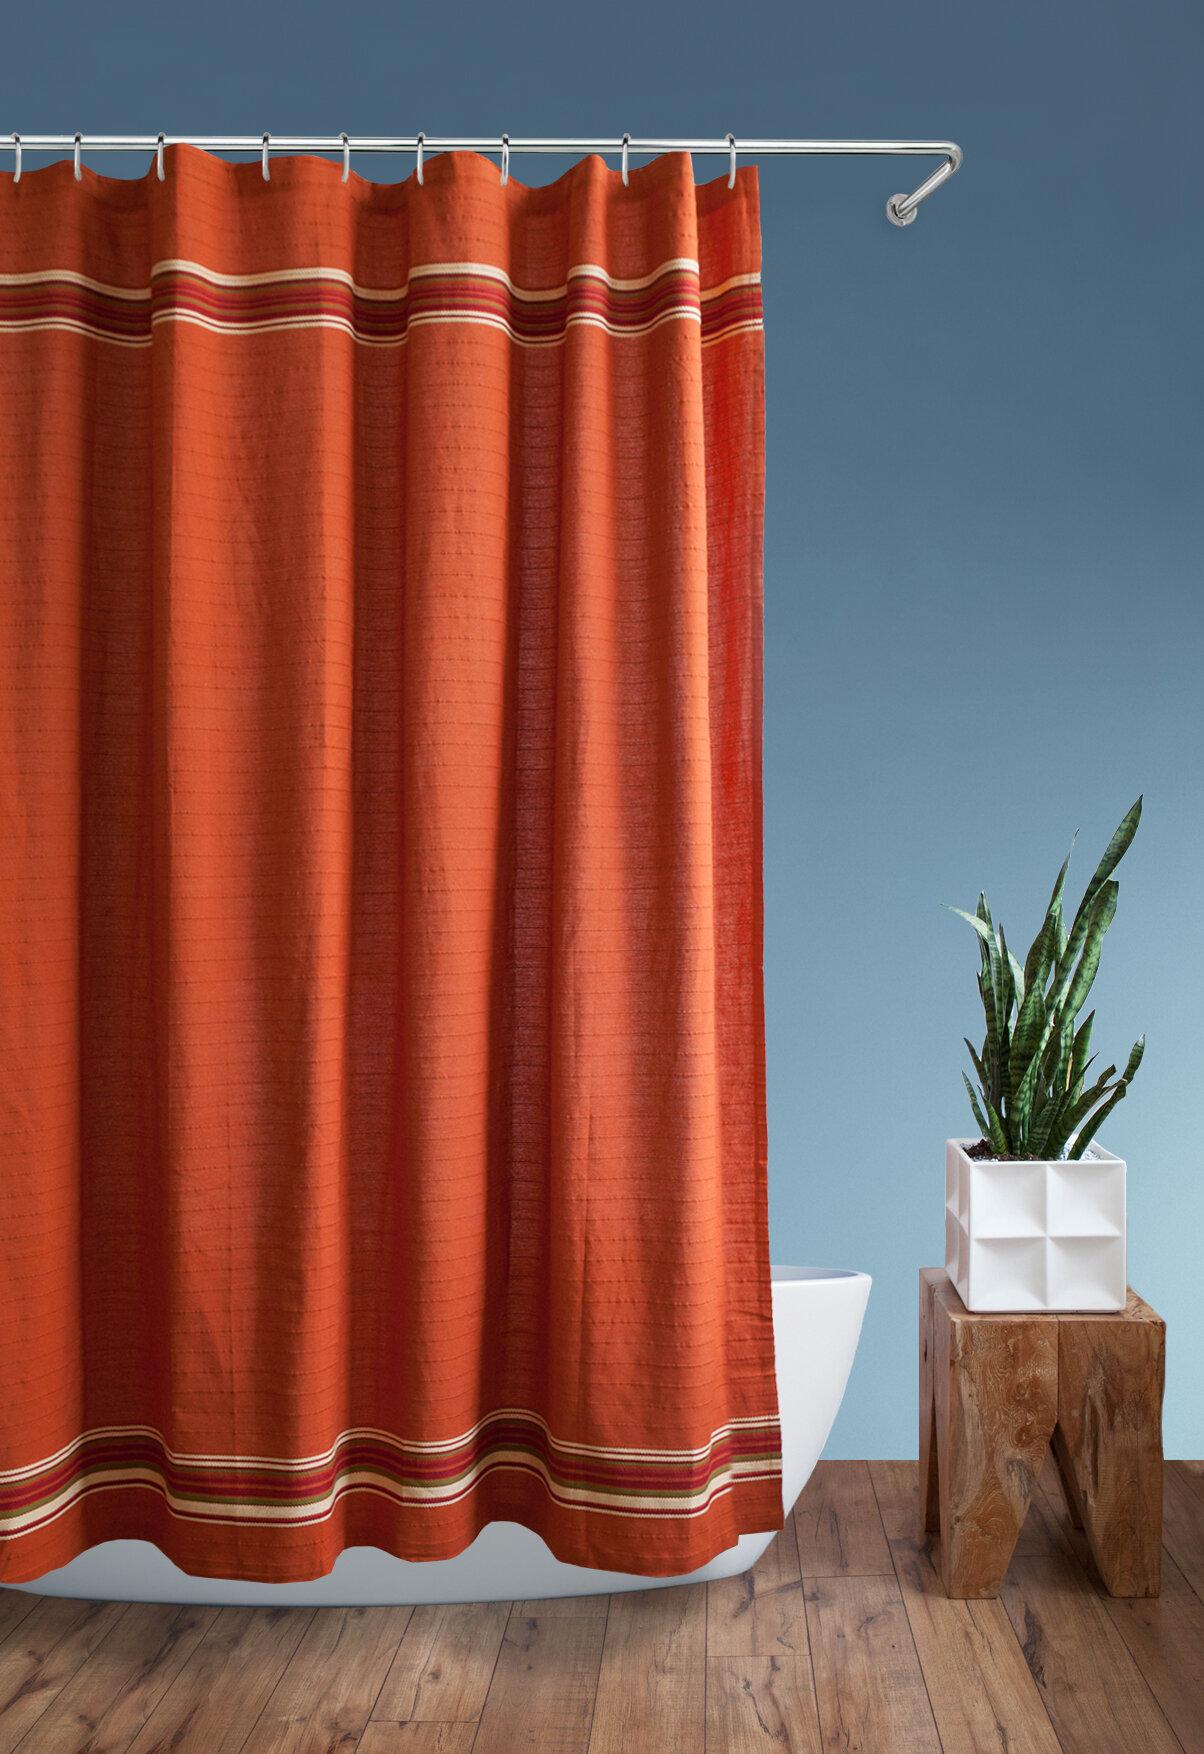 Homewear Linens Rio Grande Cotton Shower Curtain Reviews